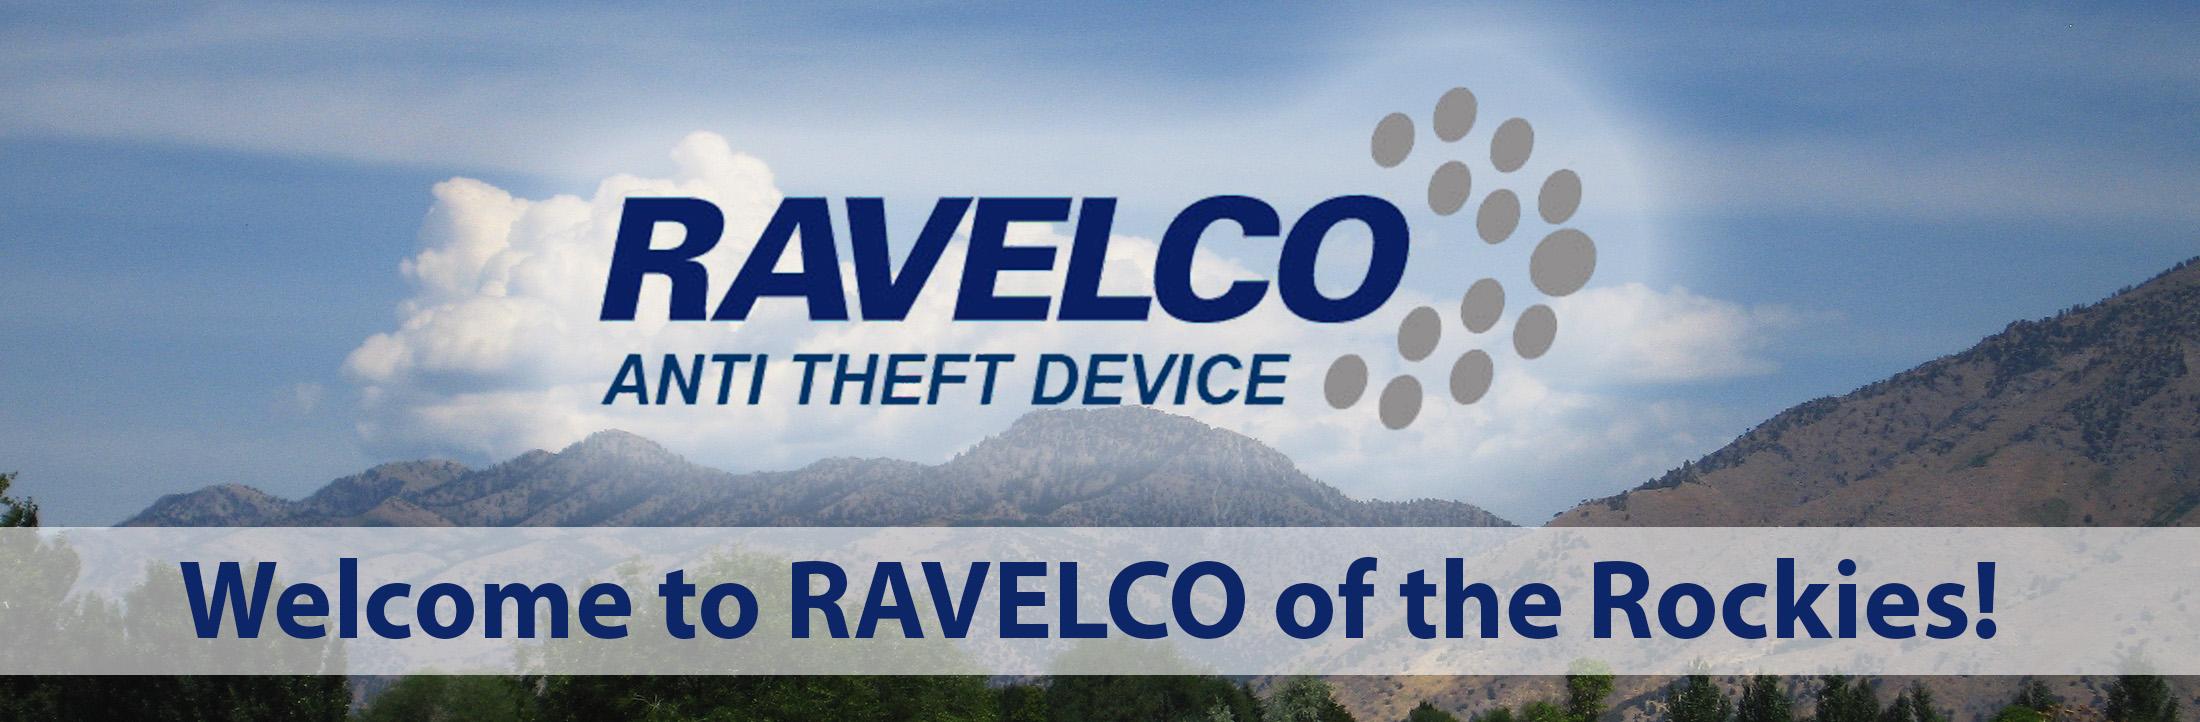 Ravelco anti theft device logo